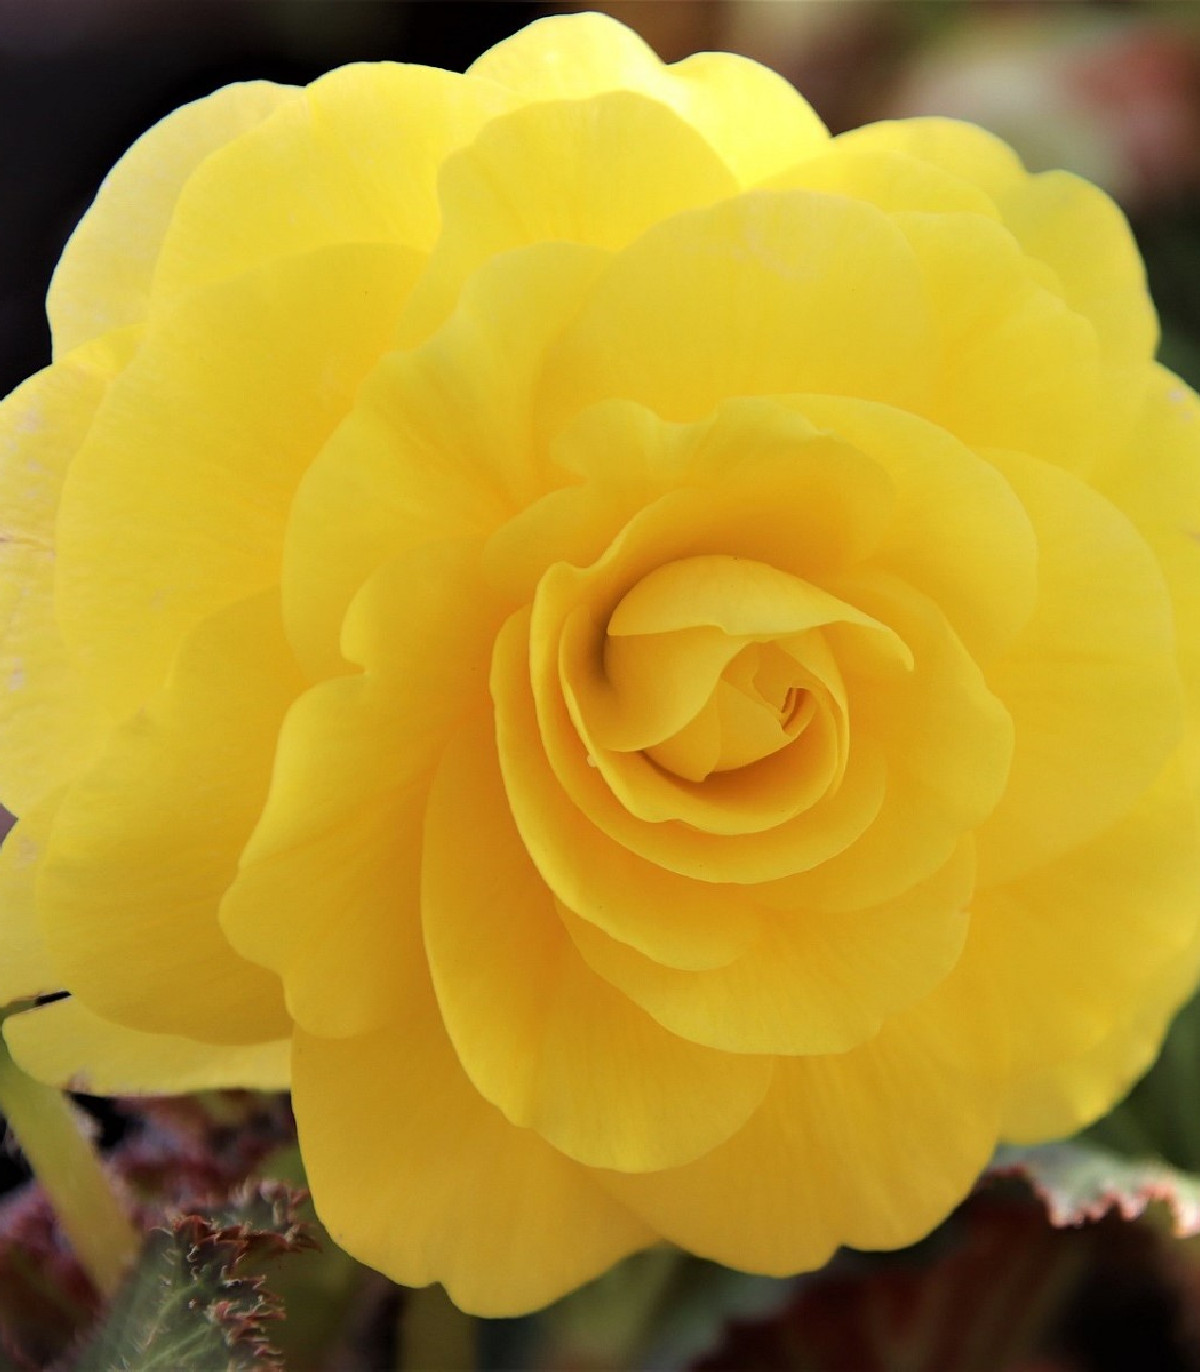 Begónia žltá - Begonia Pendula maxima - cibuľky begónie - 2 ks